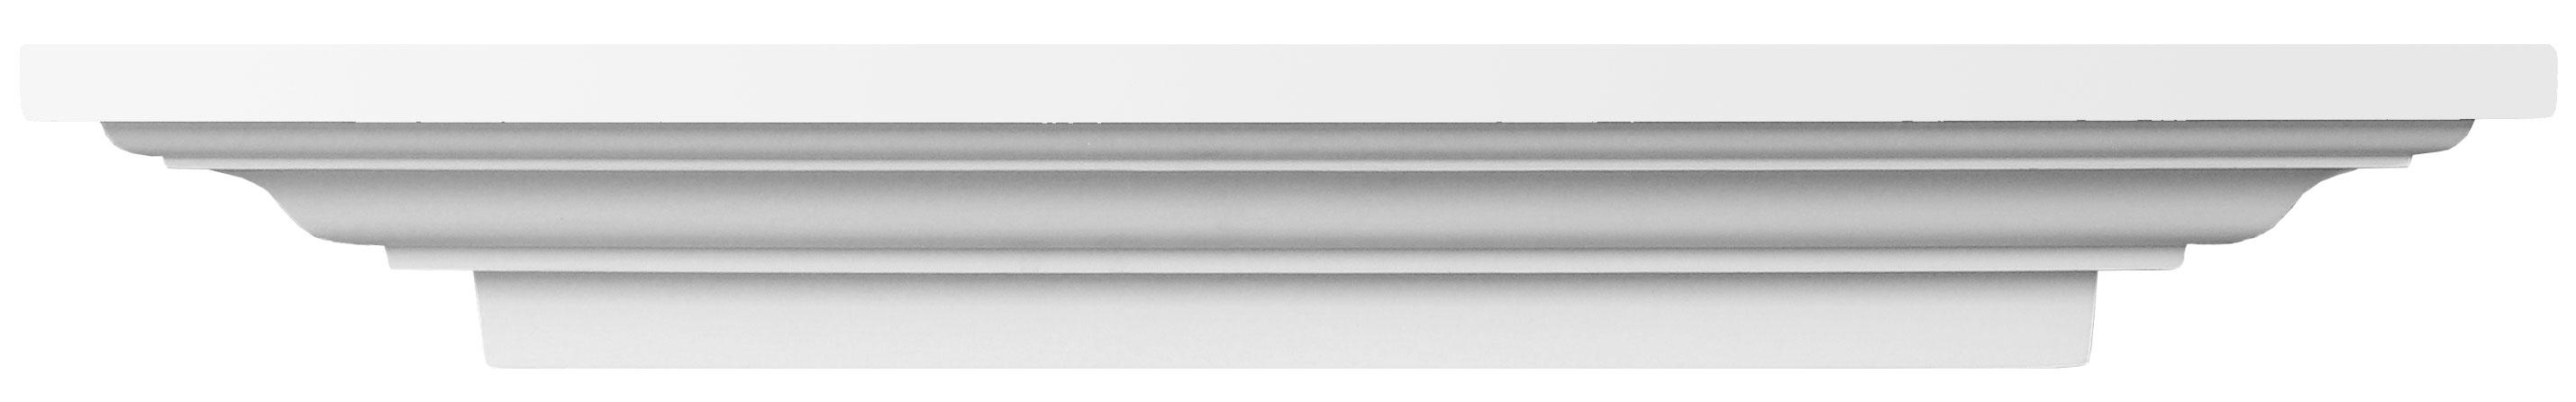 Декоративная полка Decomaster 68692 (690x118x200мм)